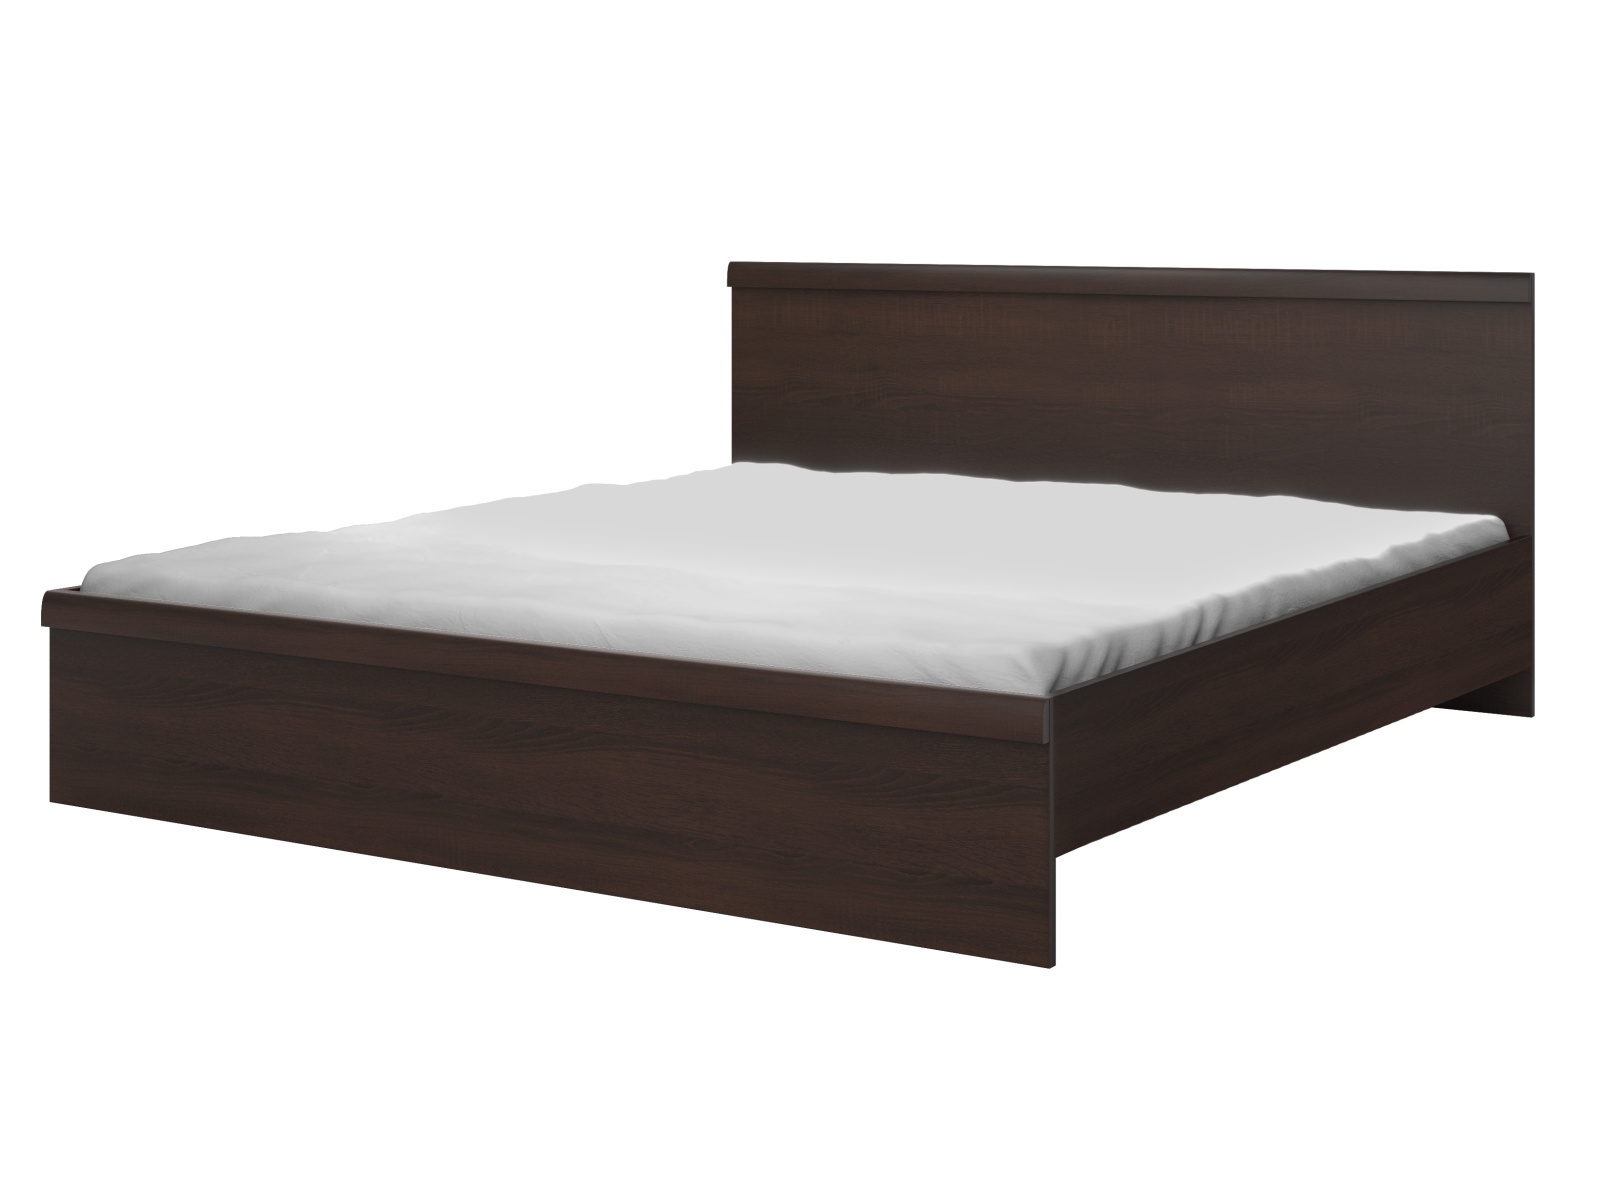 Smartshop MESTRE postel 180x200 cm TYP 32, dub sonoma tmavý